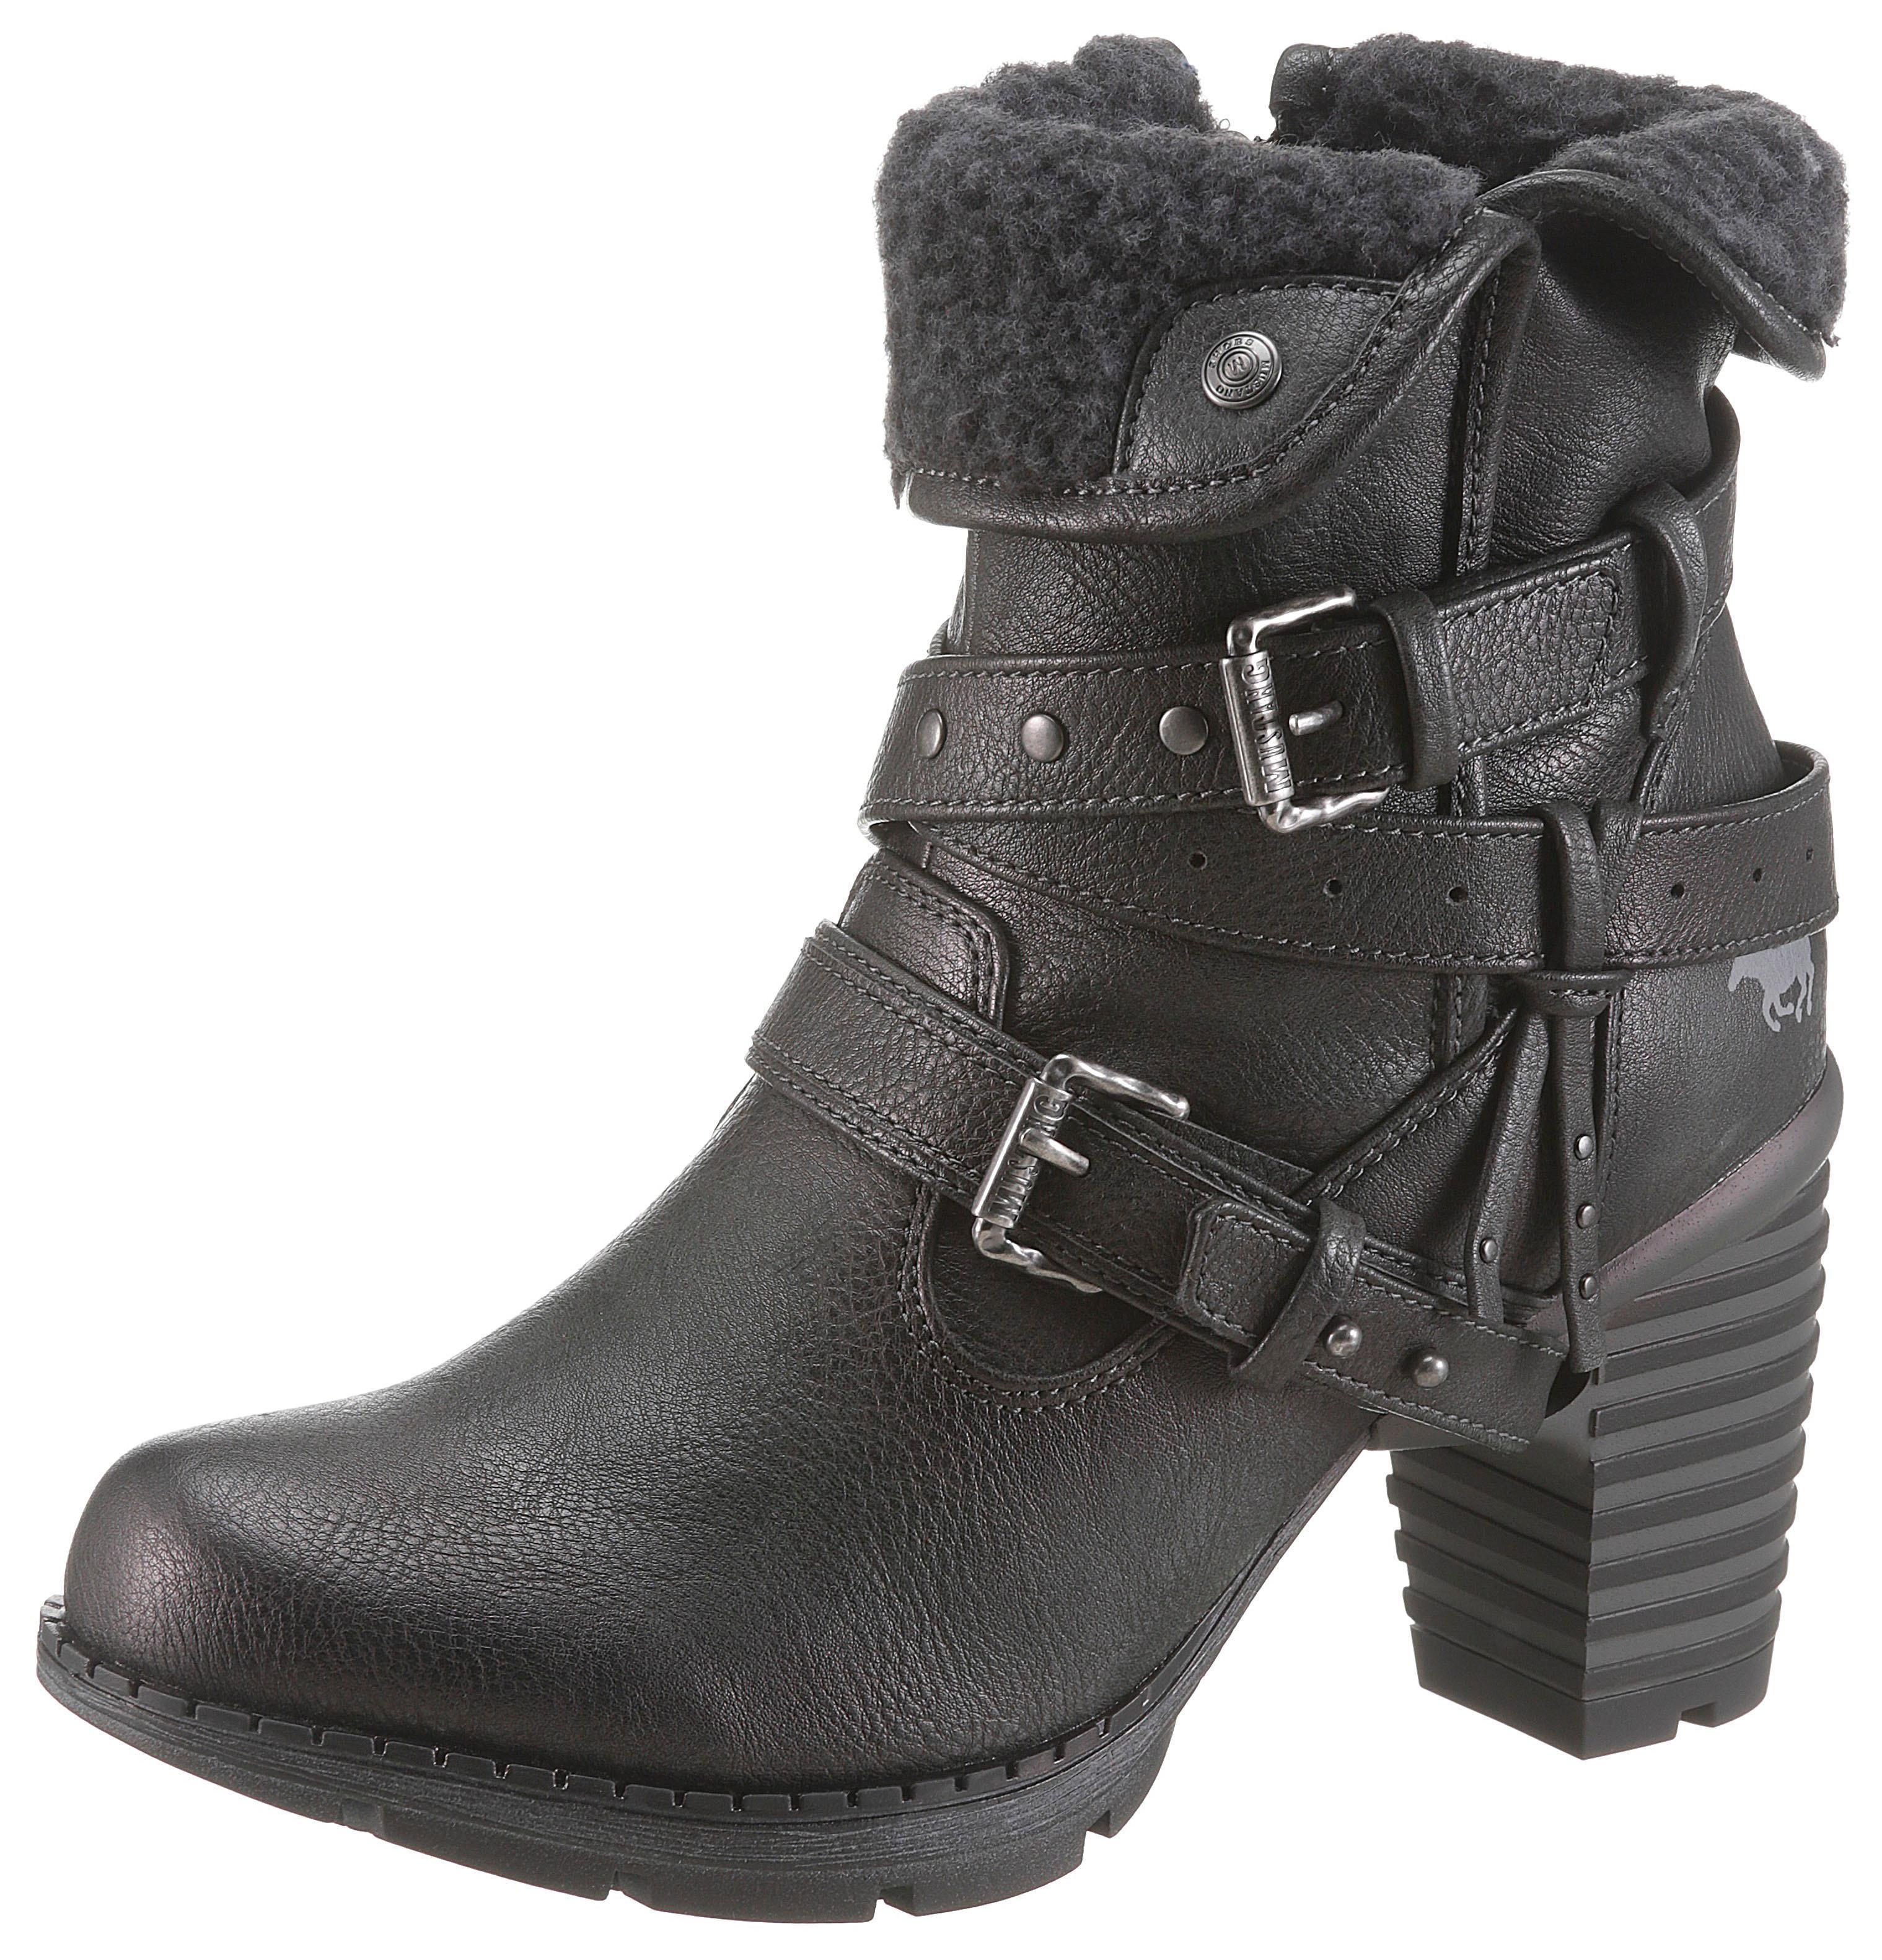 Mustang Shoes Winterstiefelette   Schuhe > Stiefeletten > Winterstiefeletten   mustang shoes